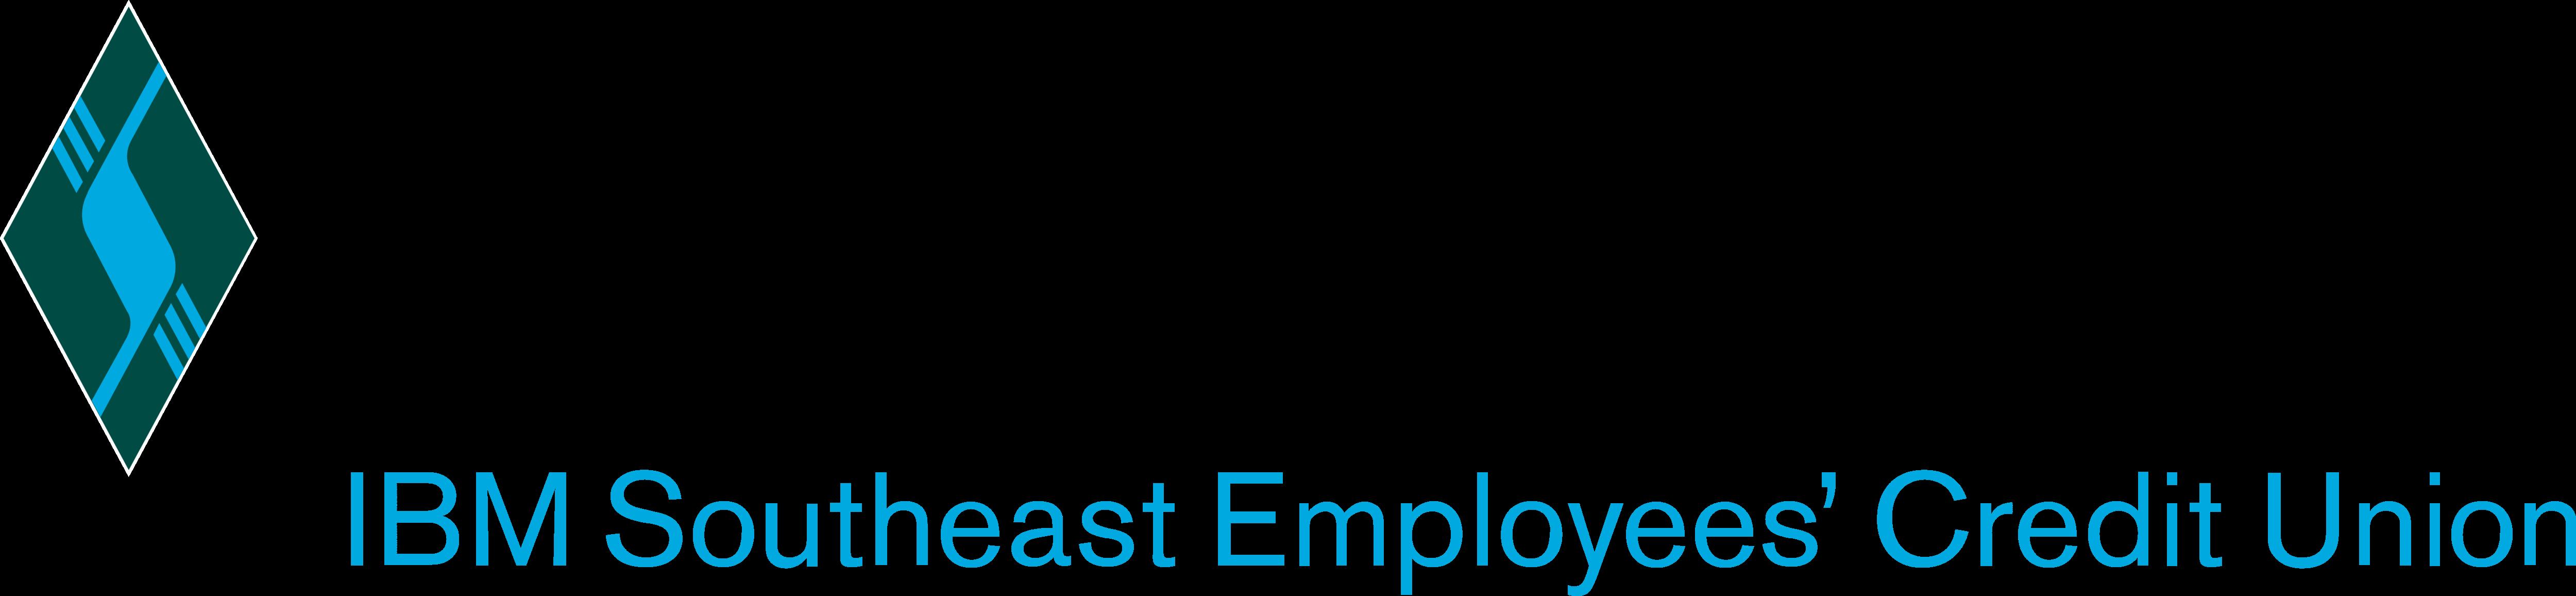 Ibmsecu Ibm Southeaste Employees Credit Union Logos